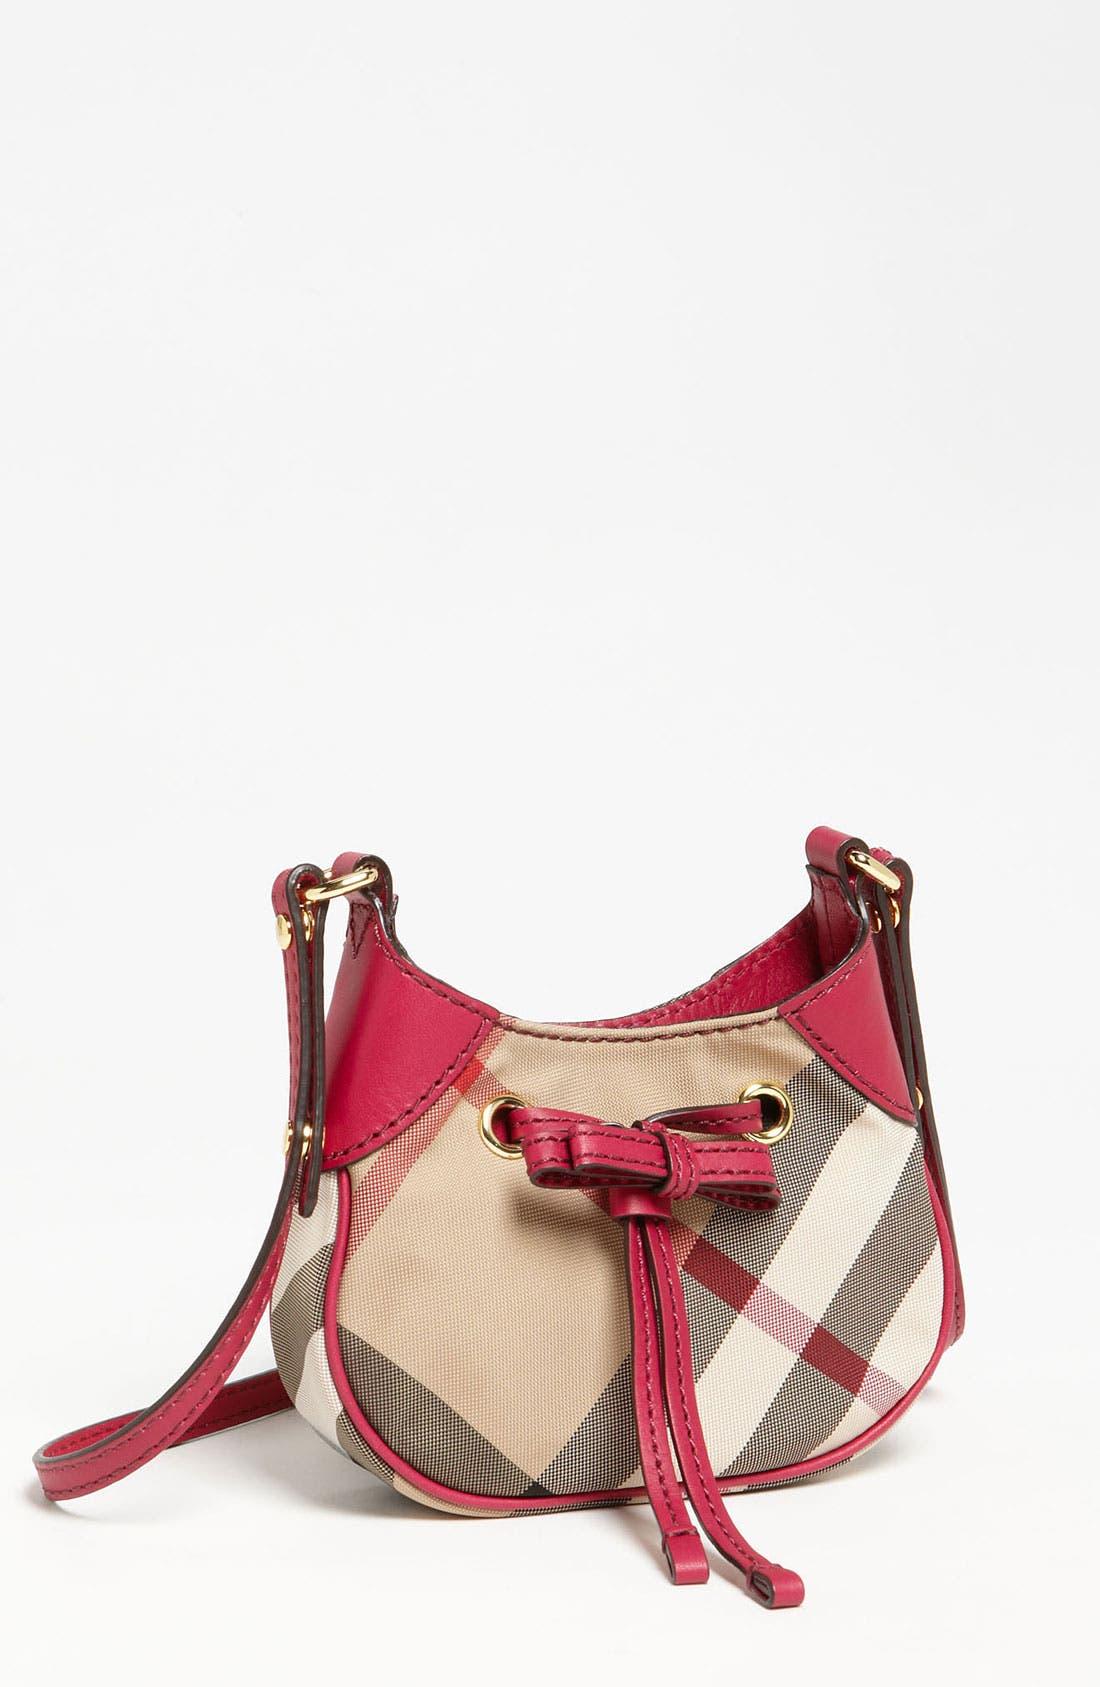 Alternate Image 1 Selected - Burberry 'Ruby' Mini Shoulder Bag (Girls)